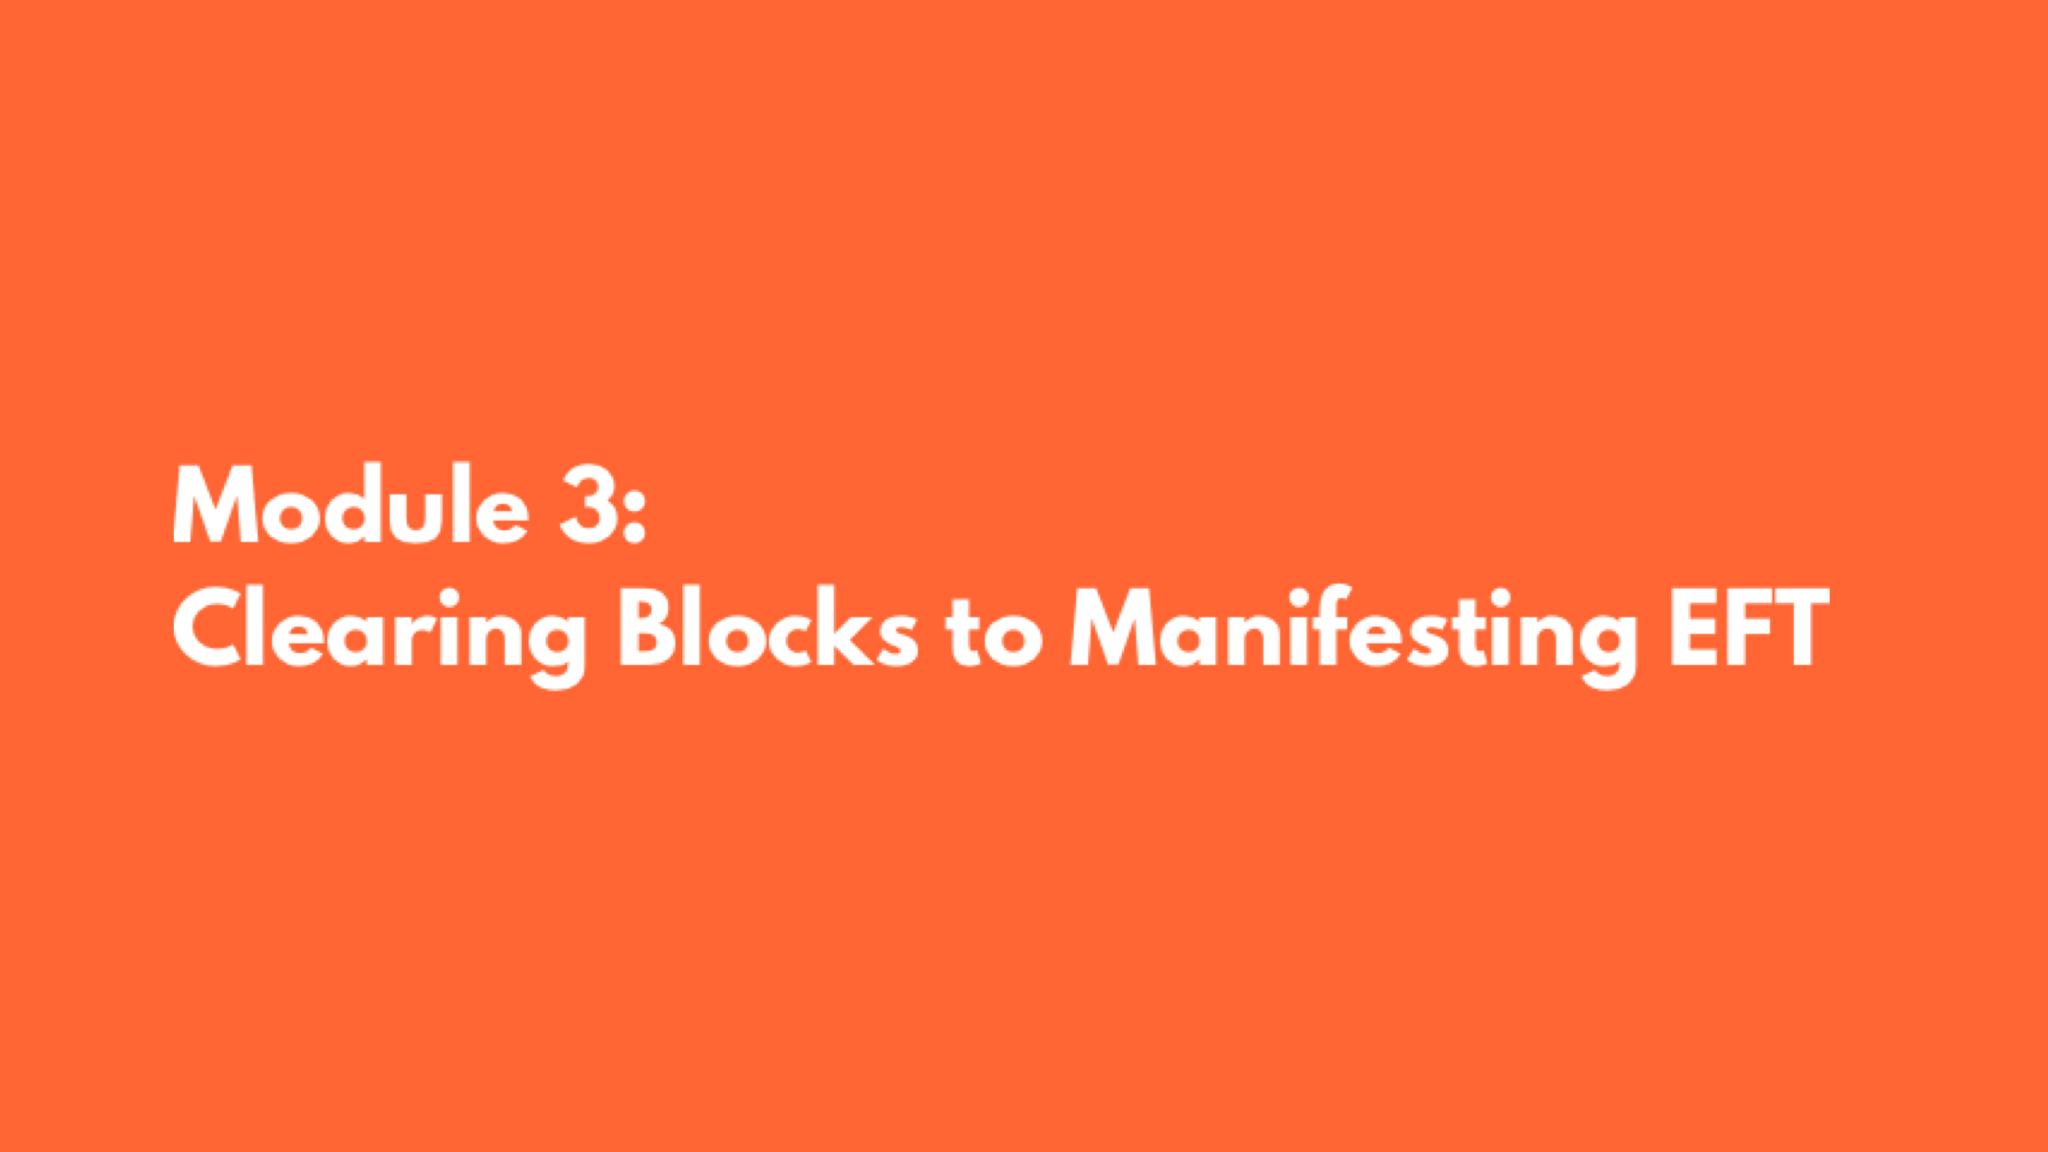 Module 3: Clearing Blocks to Manifesting